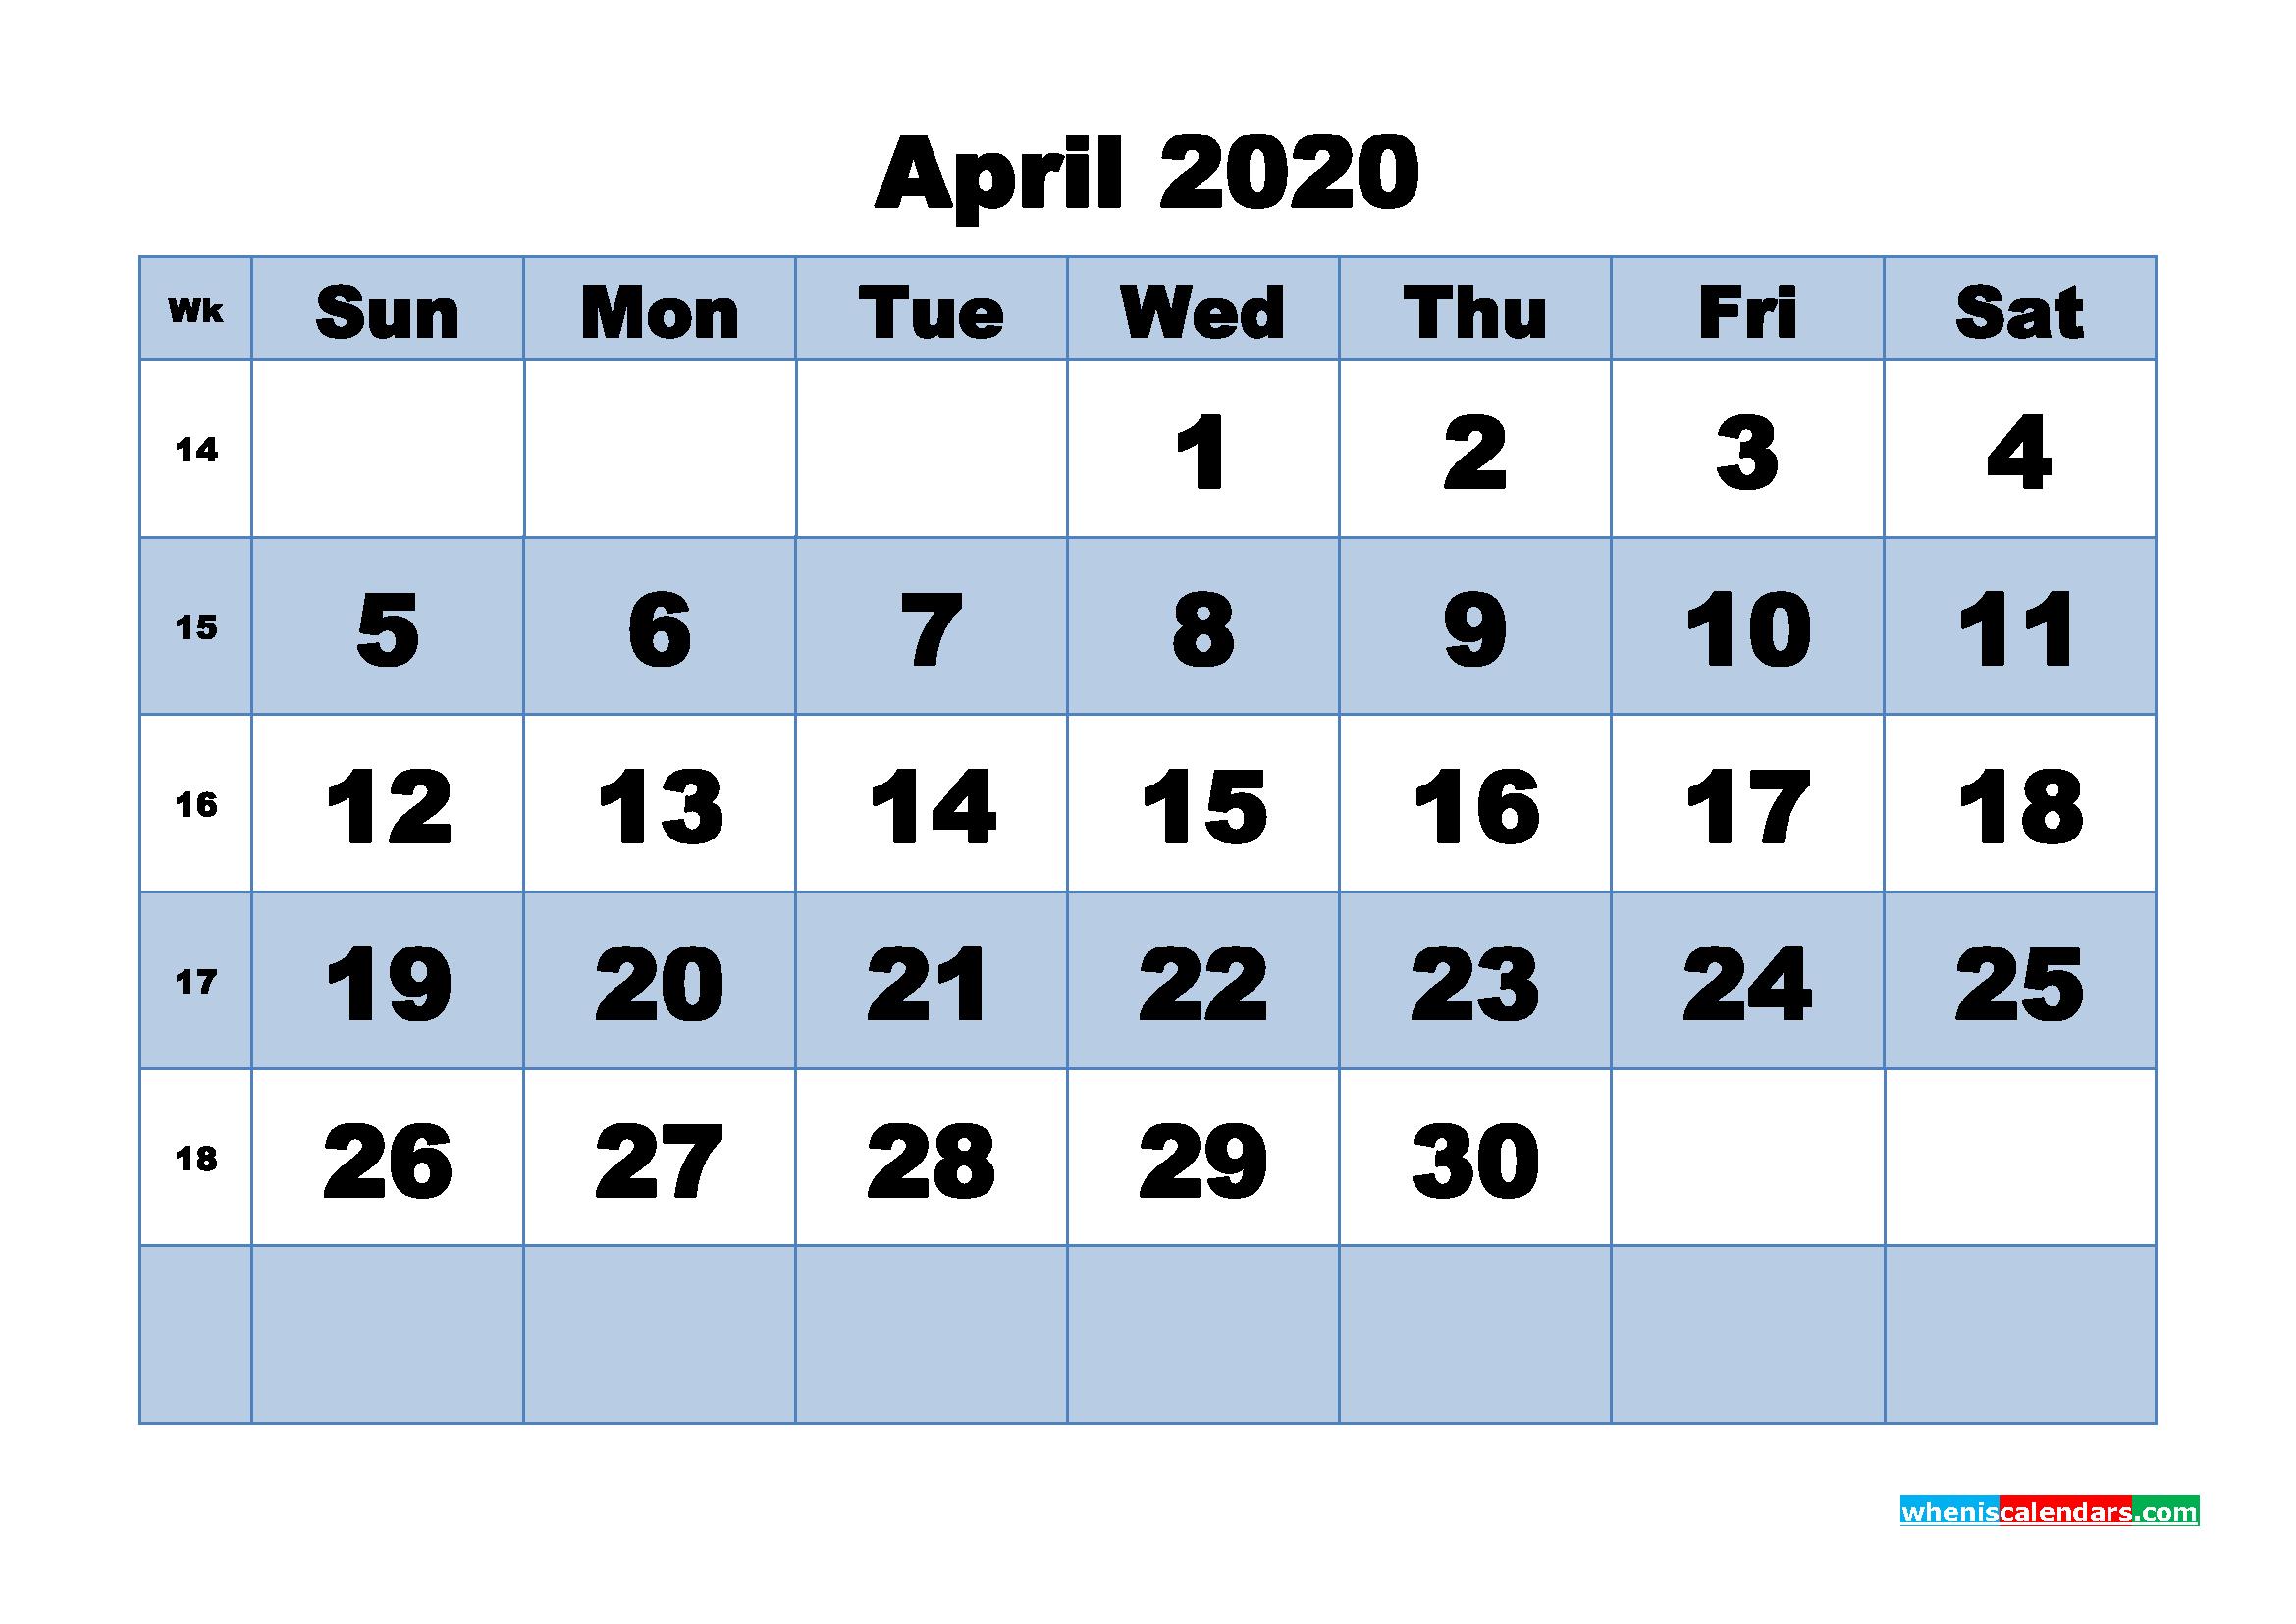 April Printable Calendar 2020 PDF, Word - No.m20b448